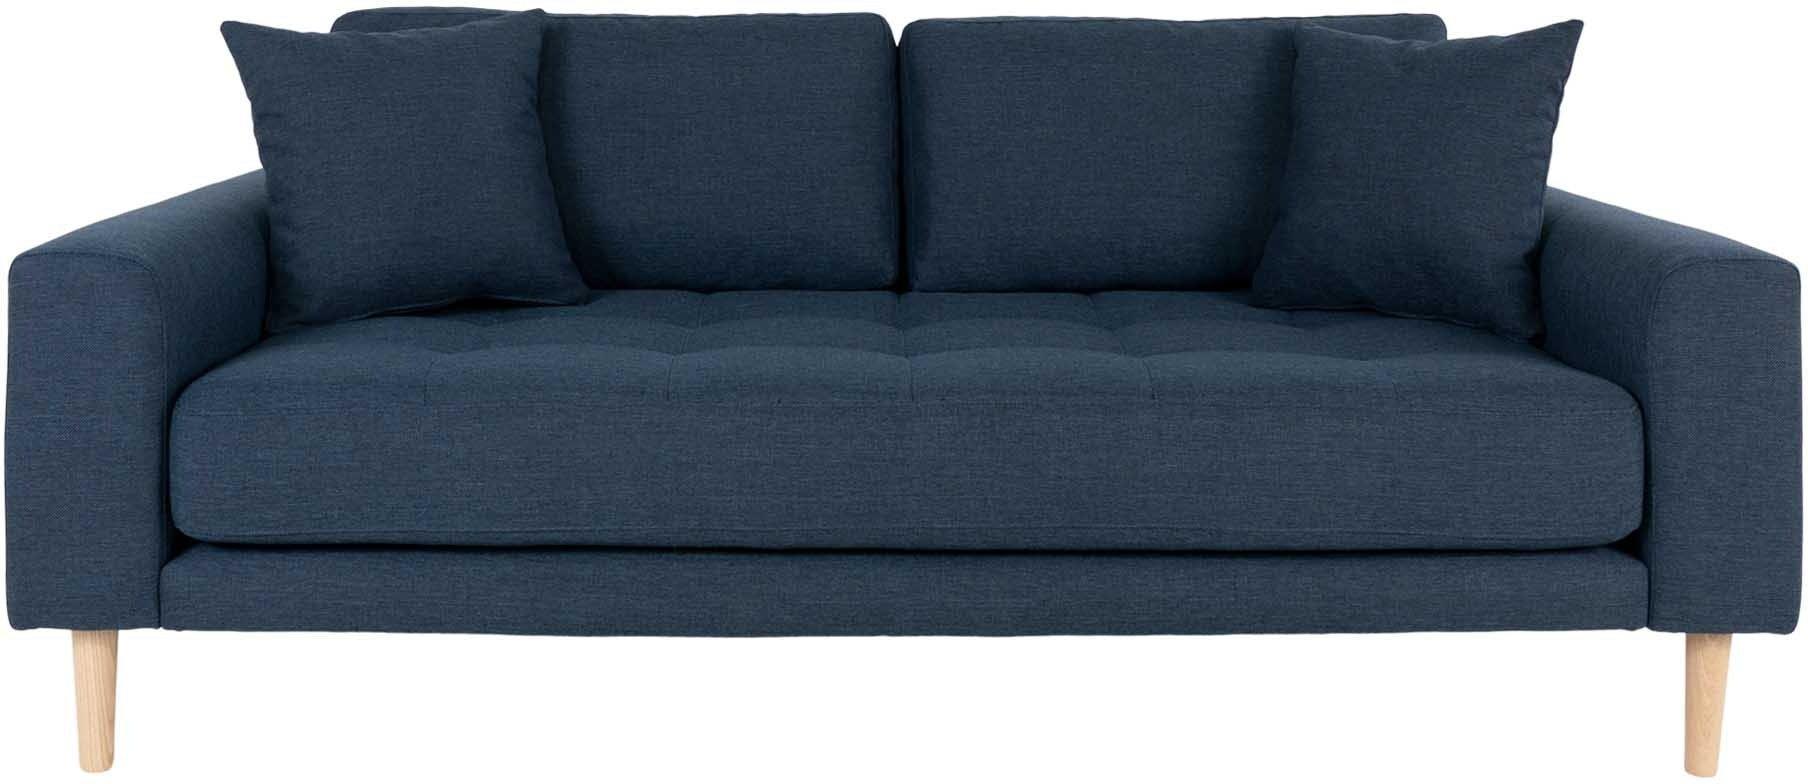 Lido, 2,5-personers sofa, Stof by Nordby (H: 76 cm. B: 180 cm. L: 93 cm., Mørkeblå)